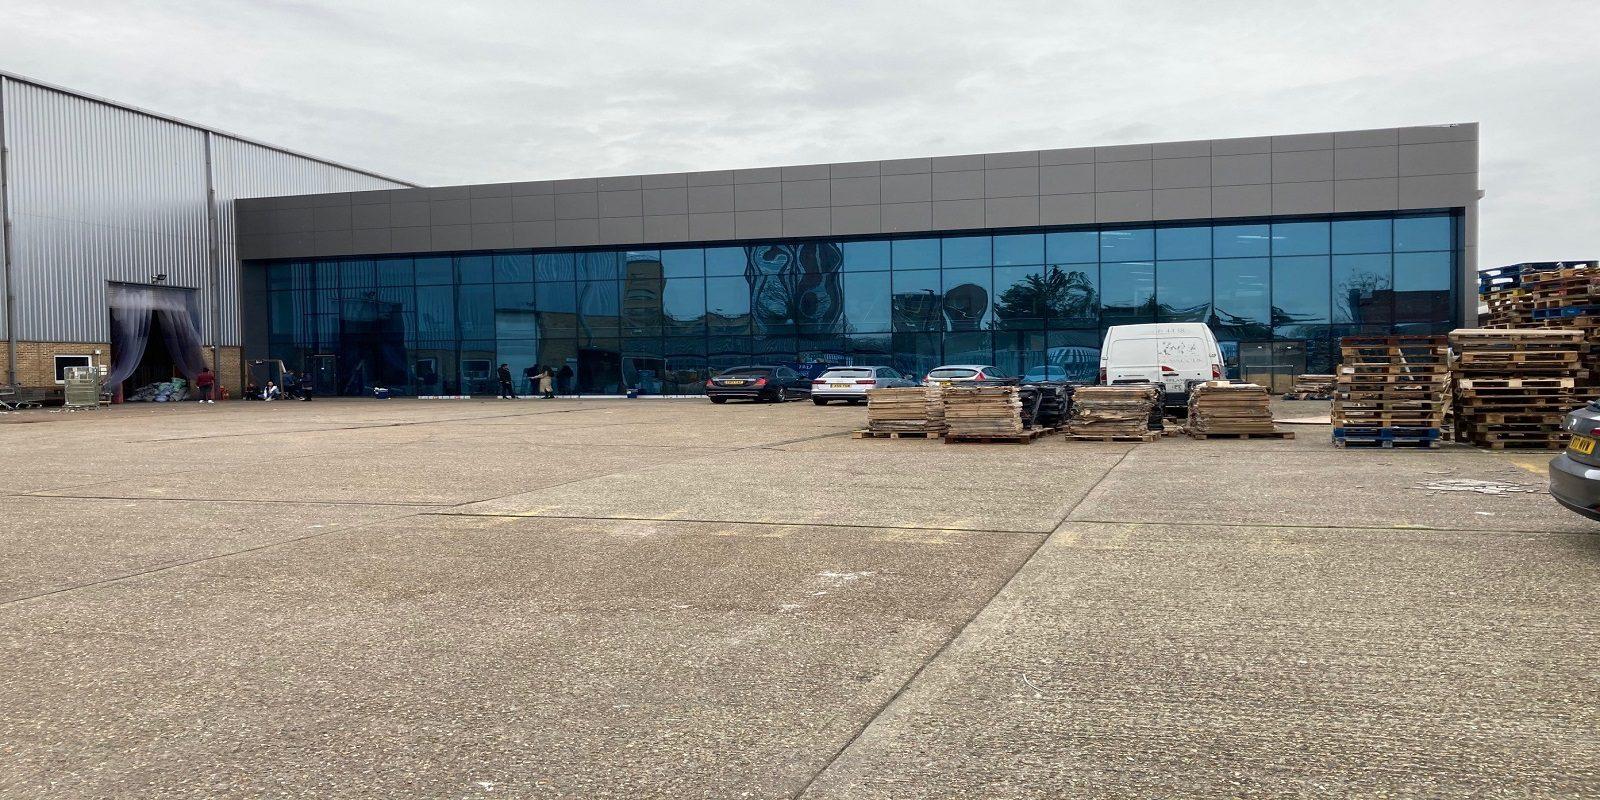 MODERN WAREHOUSE/INDUSTRIAL OFFICE BUILDING FOR SALE IN EDMONTON